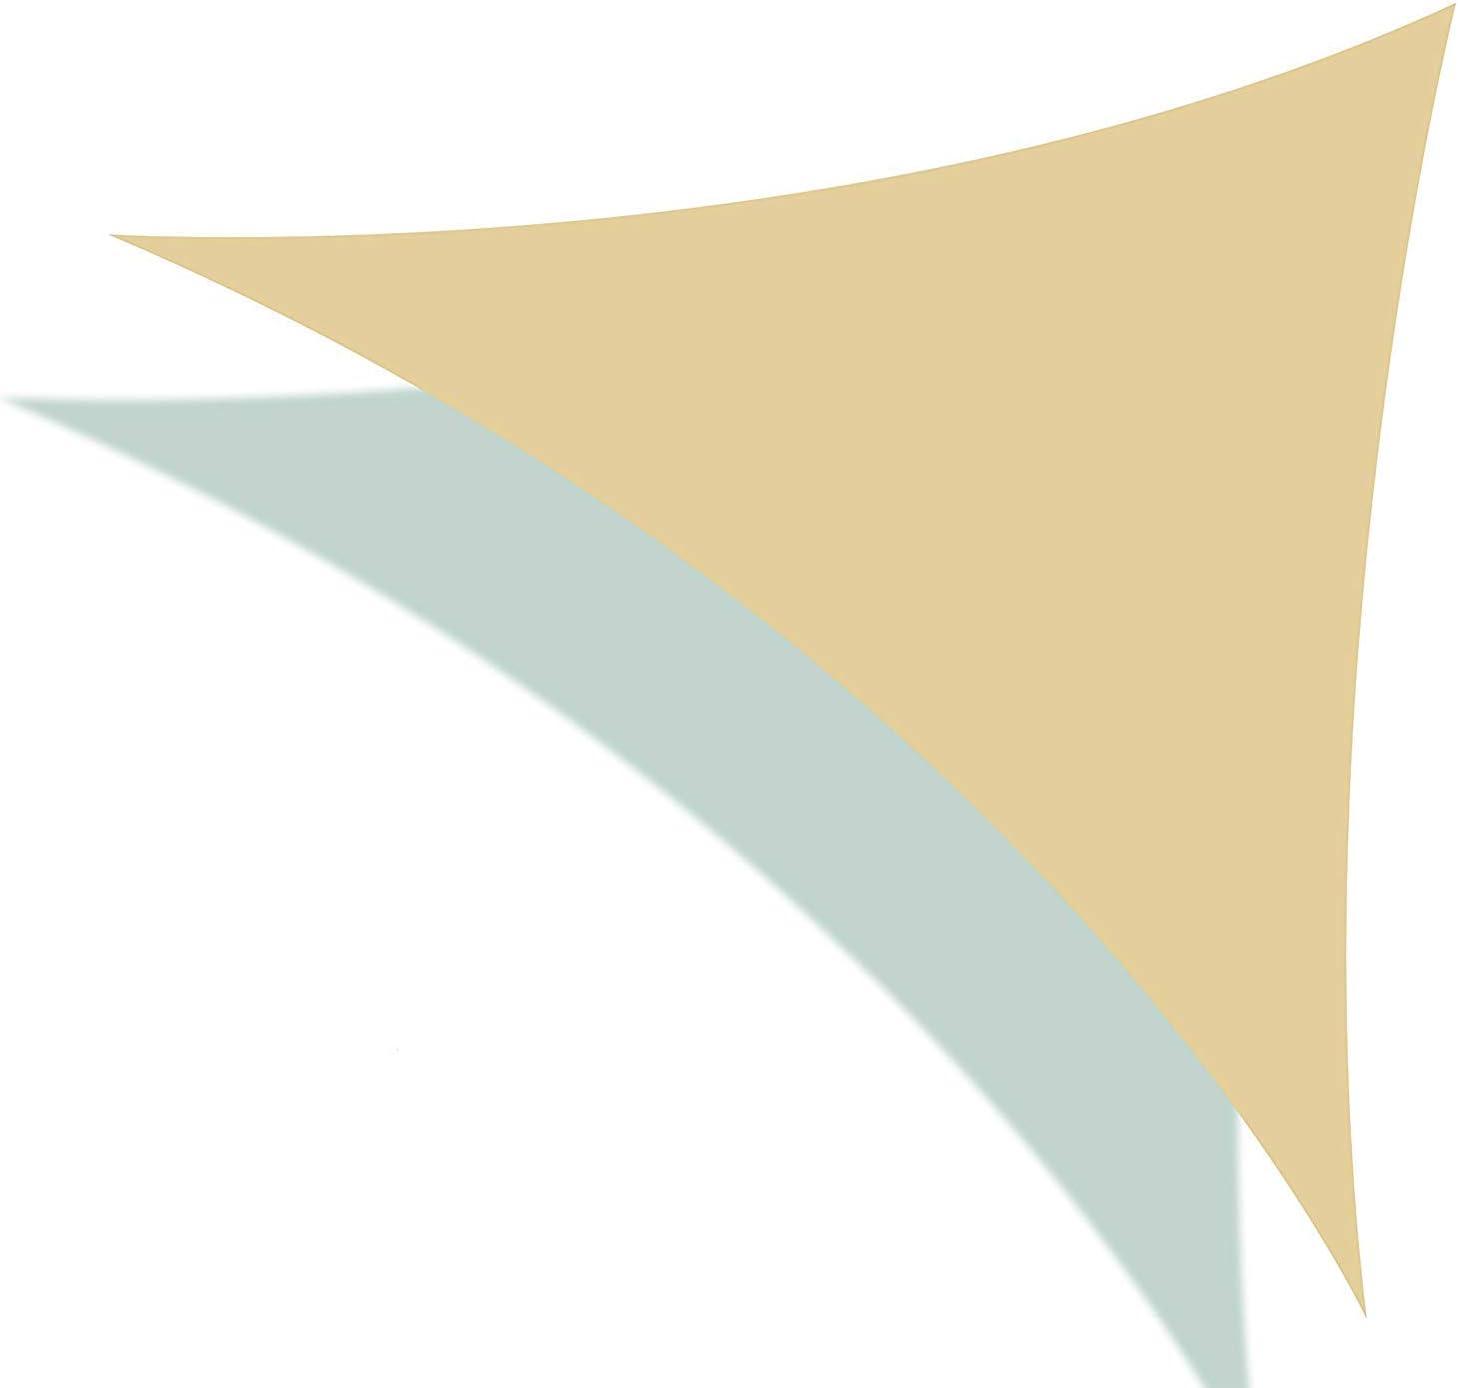 SueSport Sand Pergola Outdoor UV Block Sunshade Color 12' x 12' x 12' Sun Shade Sail Triangle for Patio Yard Deck